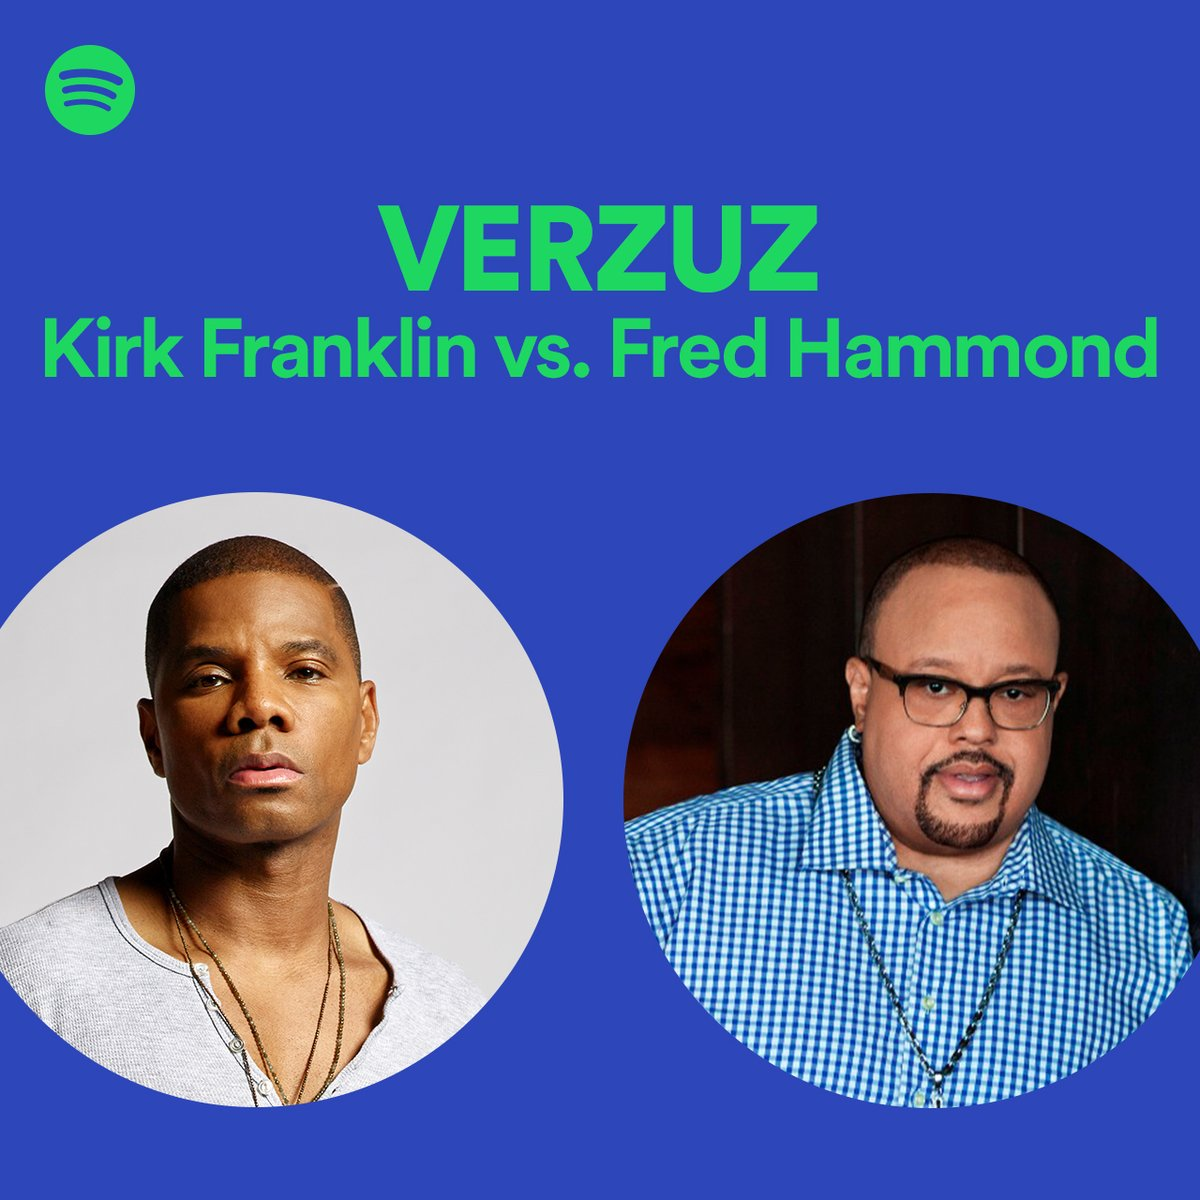 A moment for healing 🙏🏾 Kirk Franklin and Fred Hammond. The #Verzuz playlist. https://t.co/SCvJtzxMNO https://t.co/60d0PjIDXL